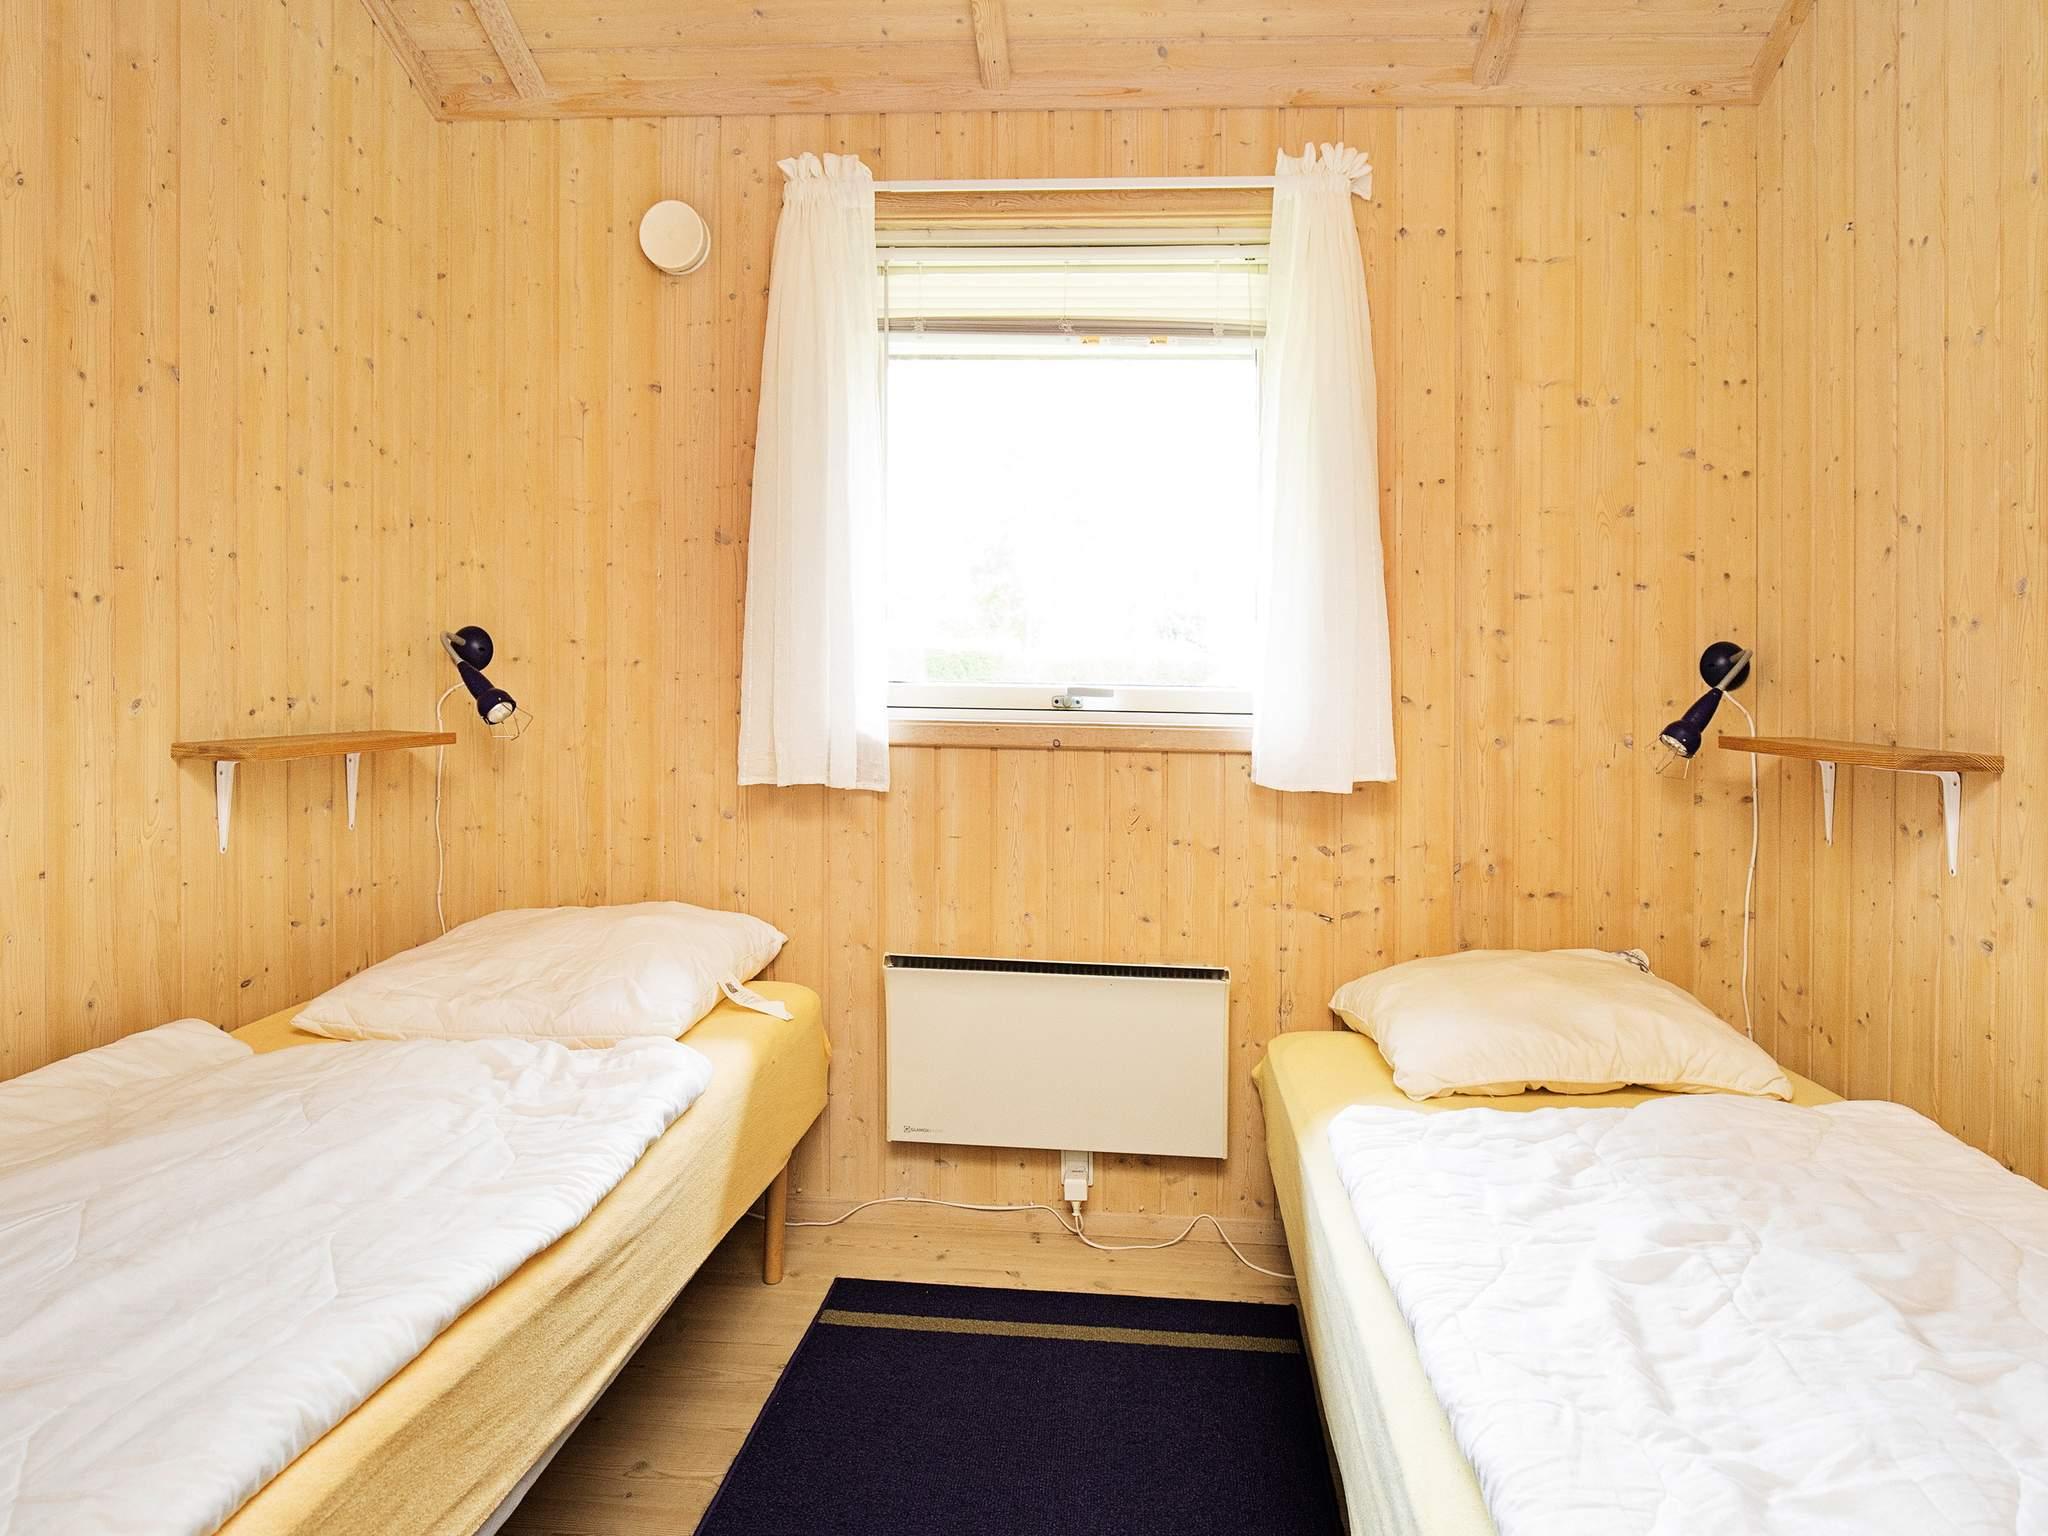 Ferienhaus Hornbæk (87412), Hornbæk, , Nordseeland, Dänemark, Bild 14